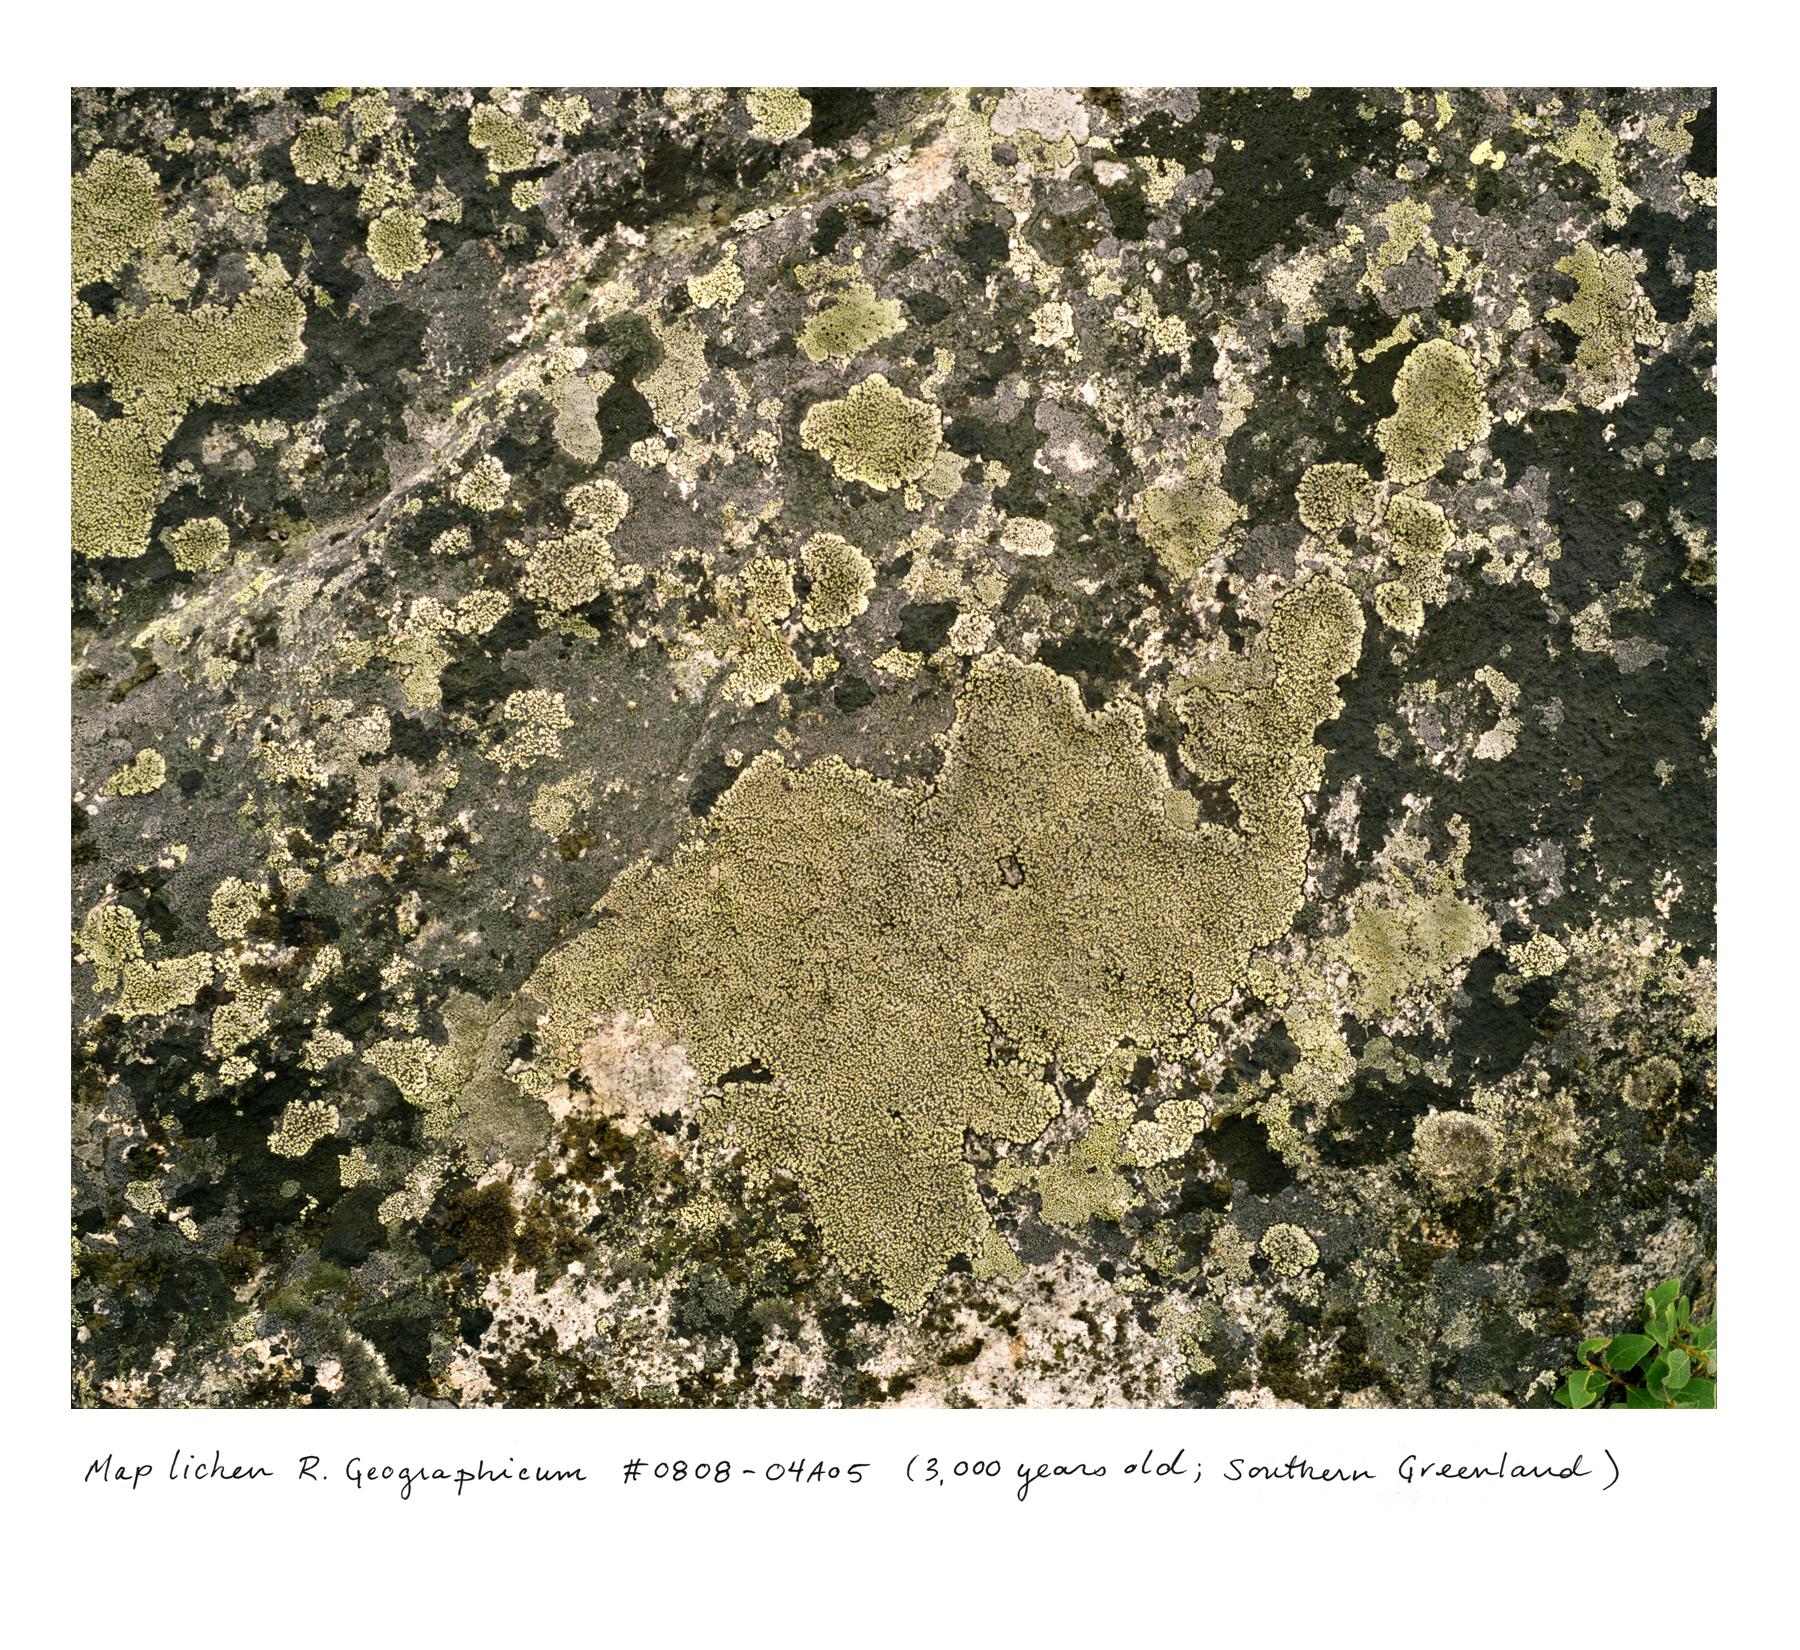 Greenland_lichens_0808_04a05.jpg